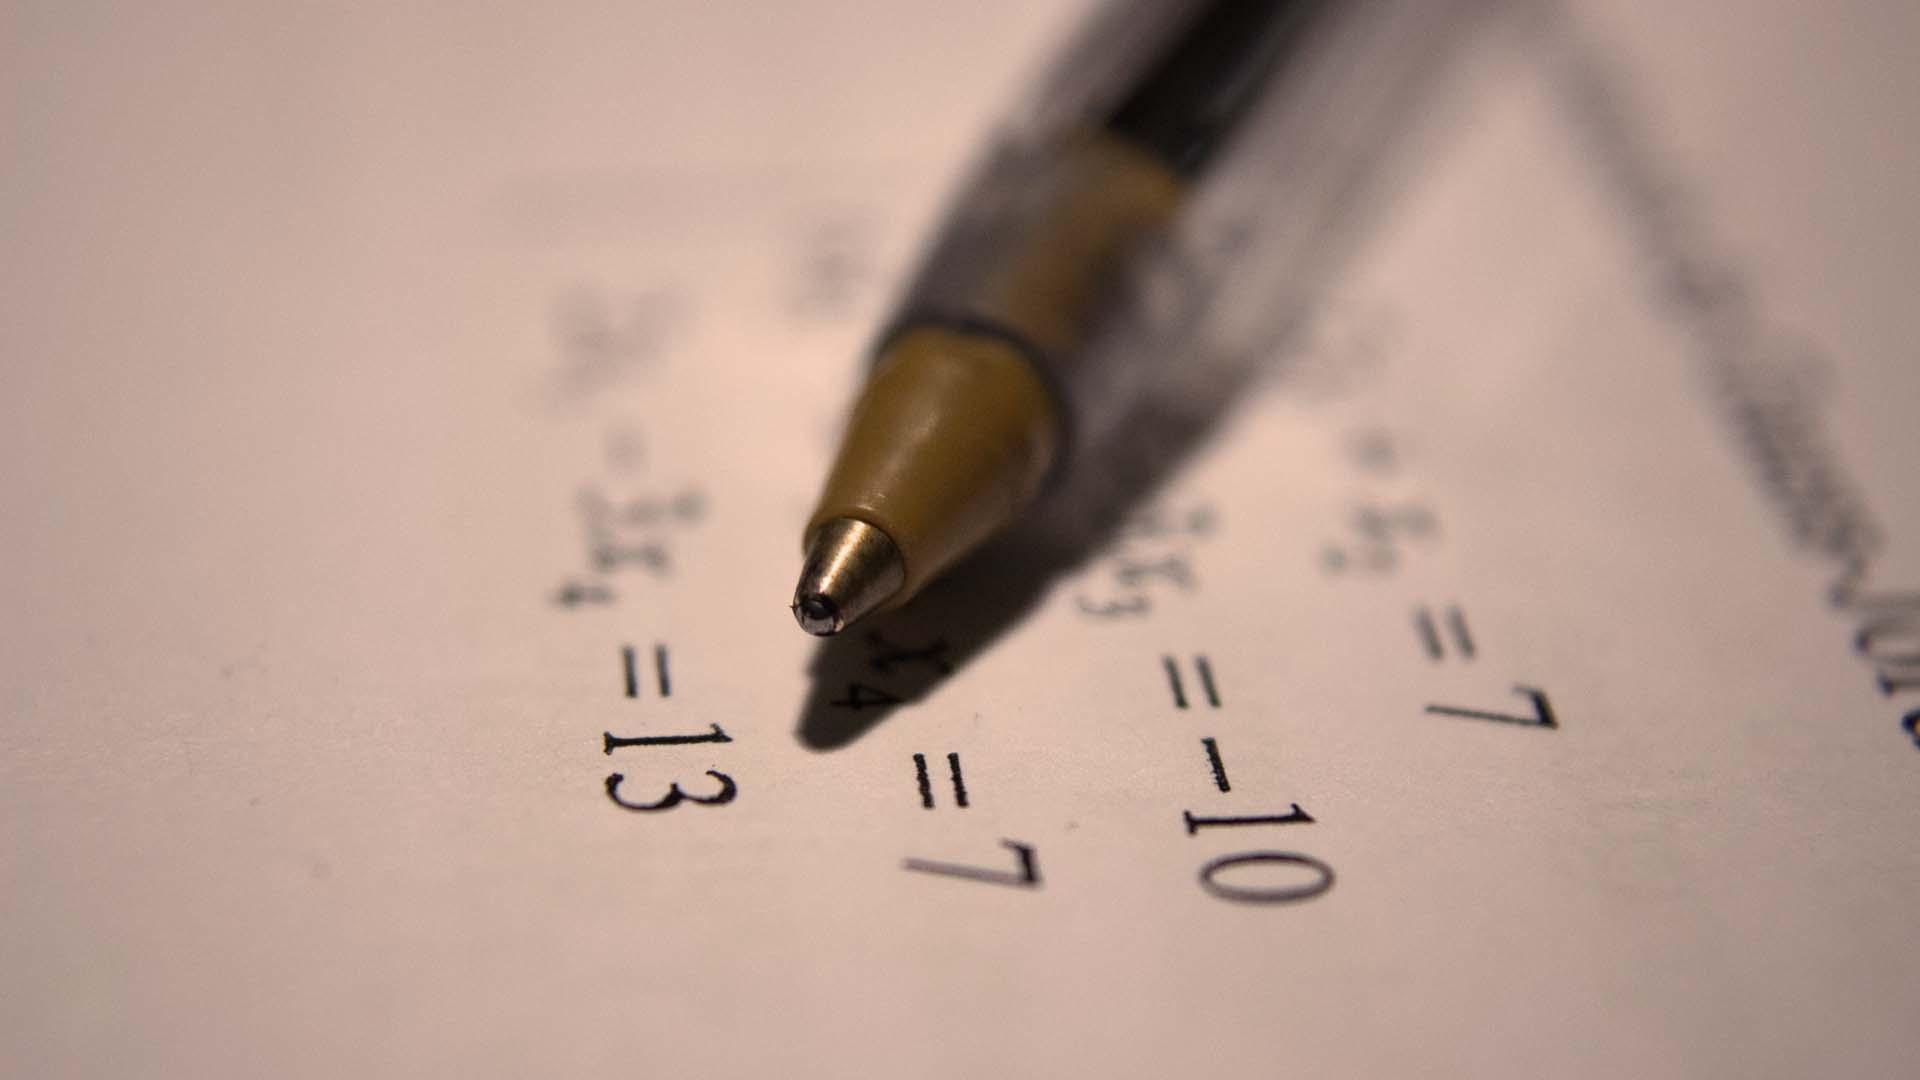 Come_creare_un_menu_a_tendina_in_Excel